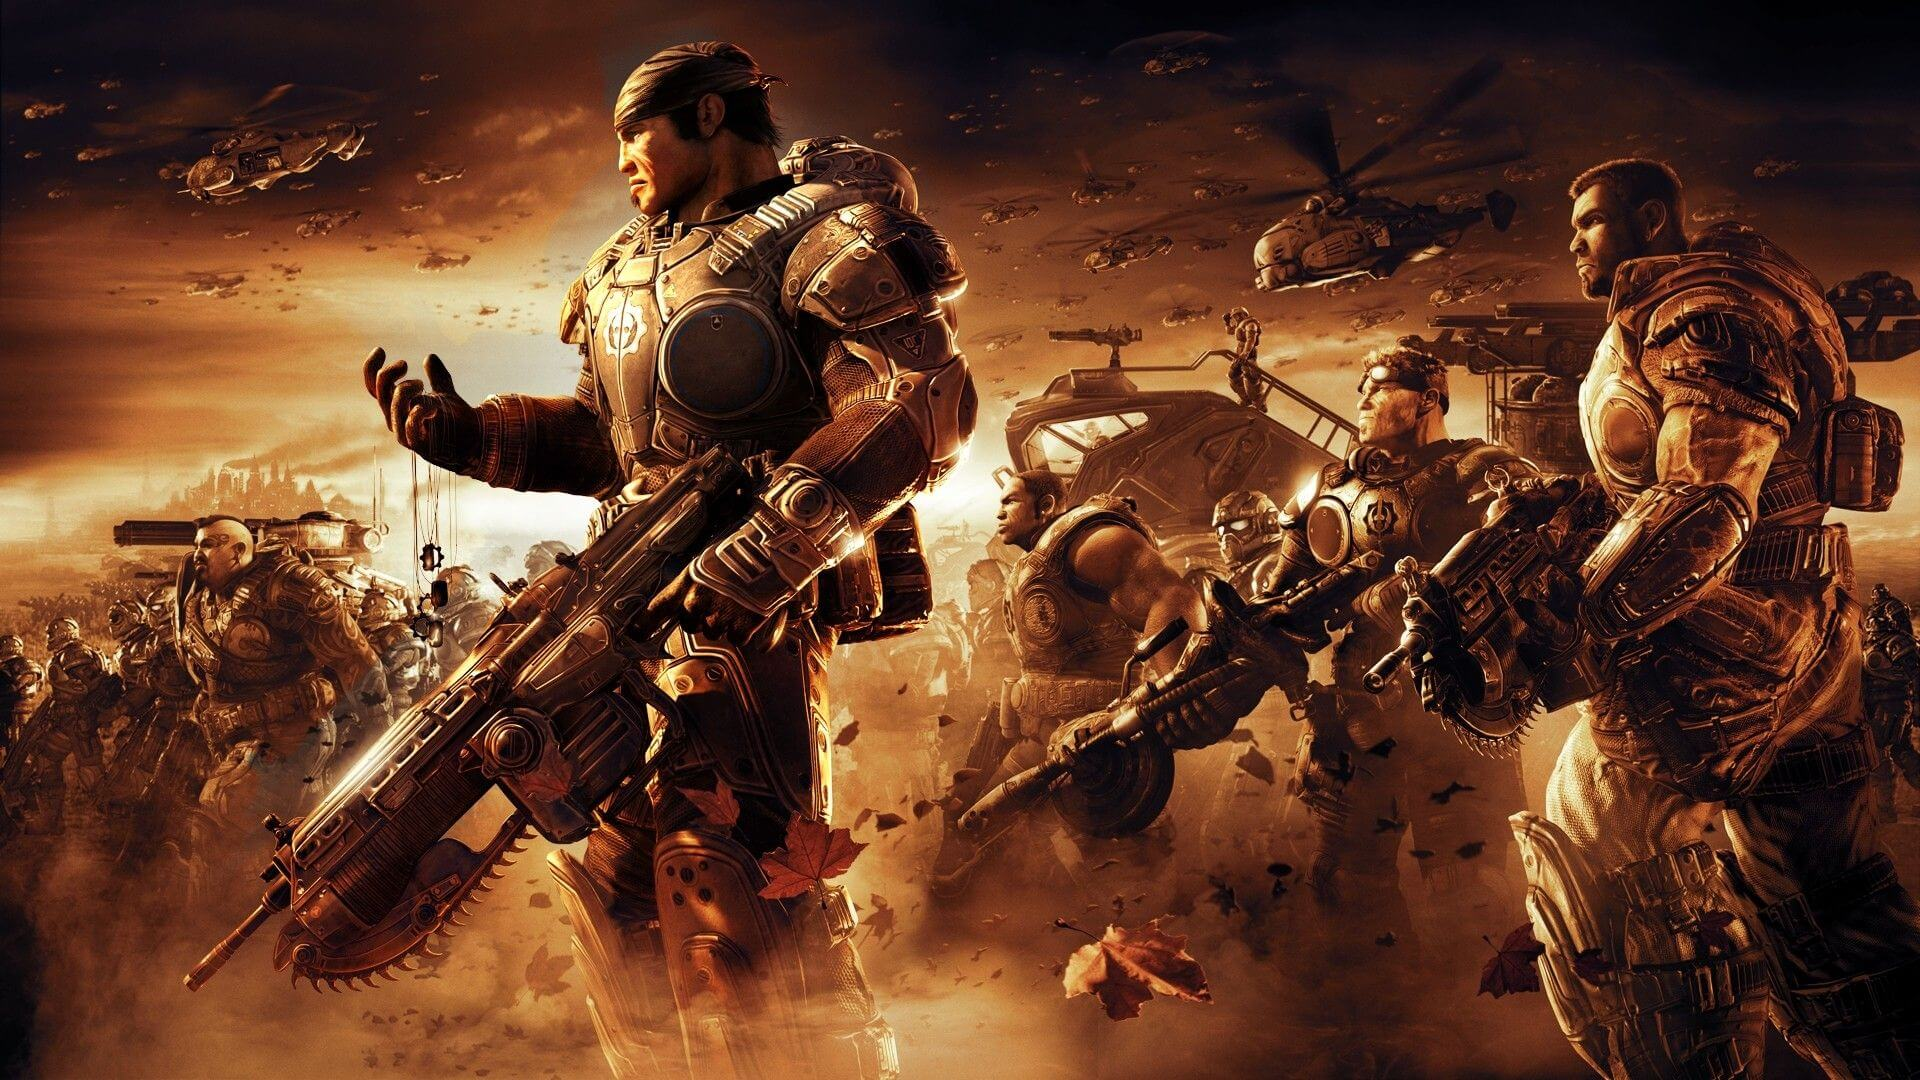 Gears-of-War-2-1